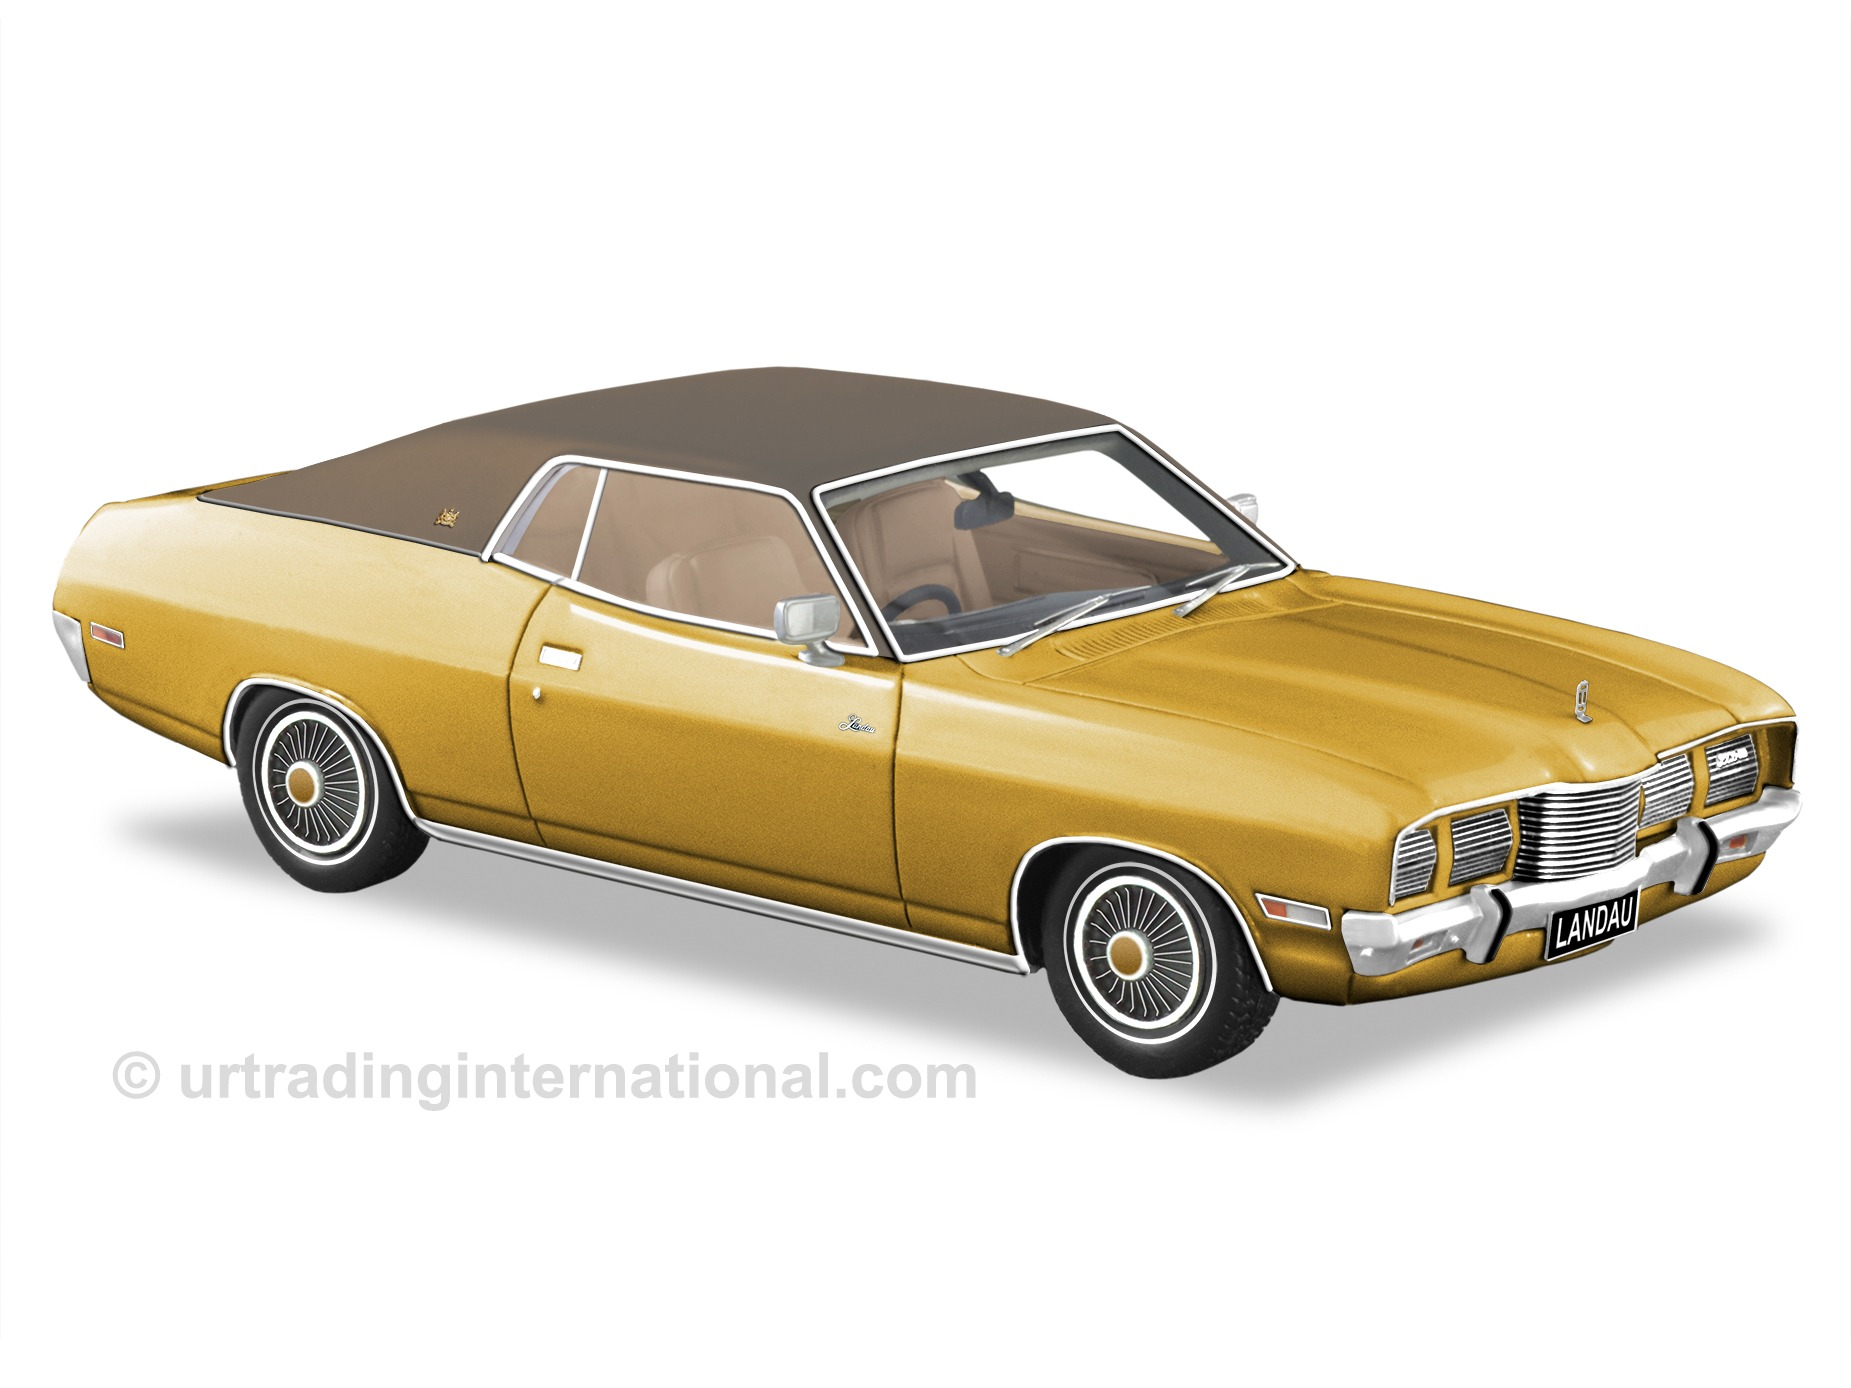 1975 Ford Landau – Tropic Gold.